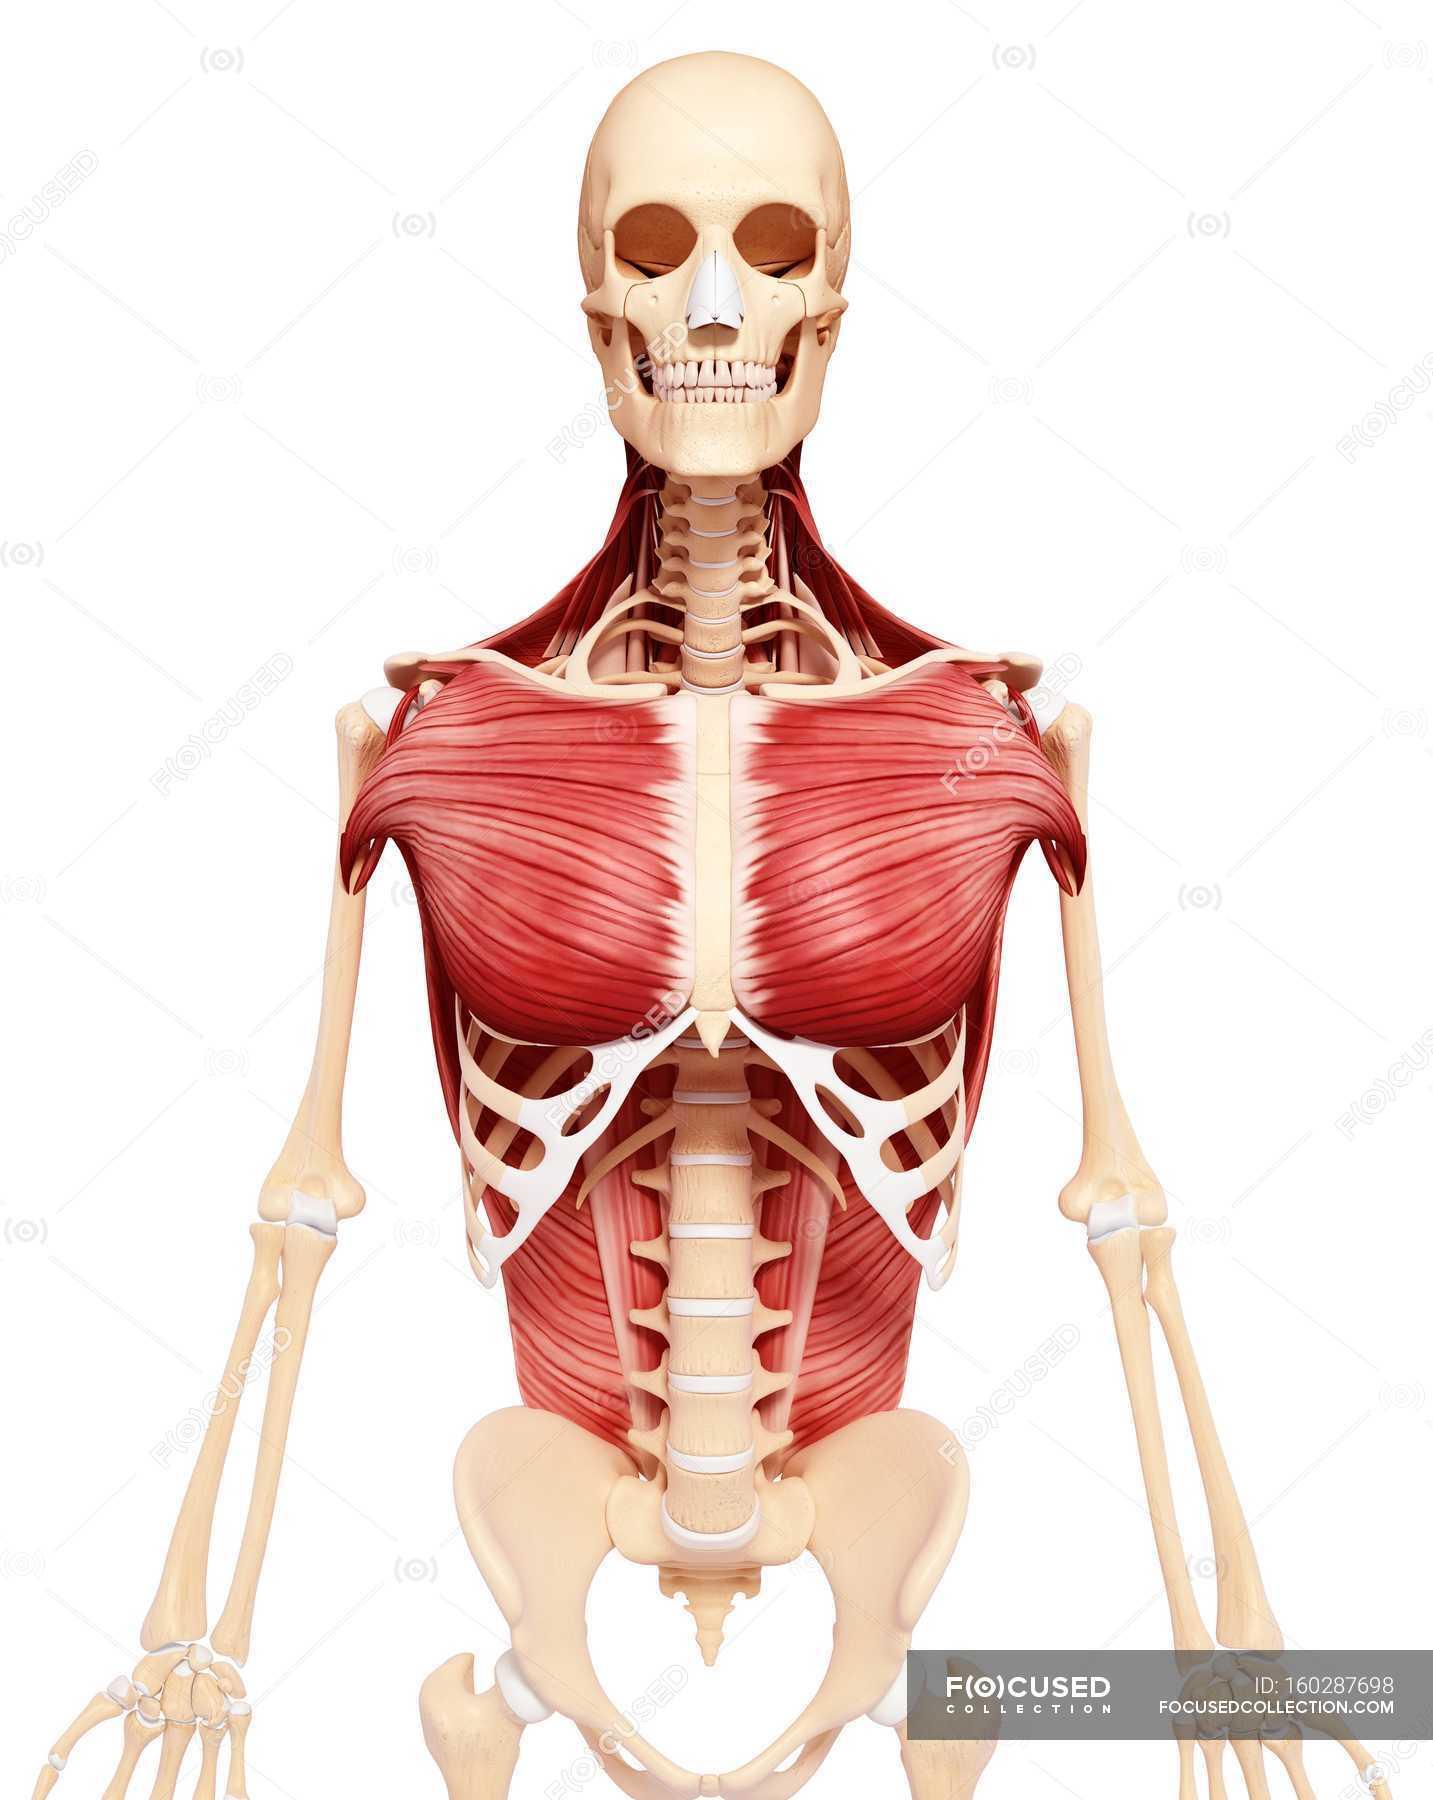 Brust und Rücken Muskulatur — Stockfoto | #160287698